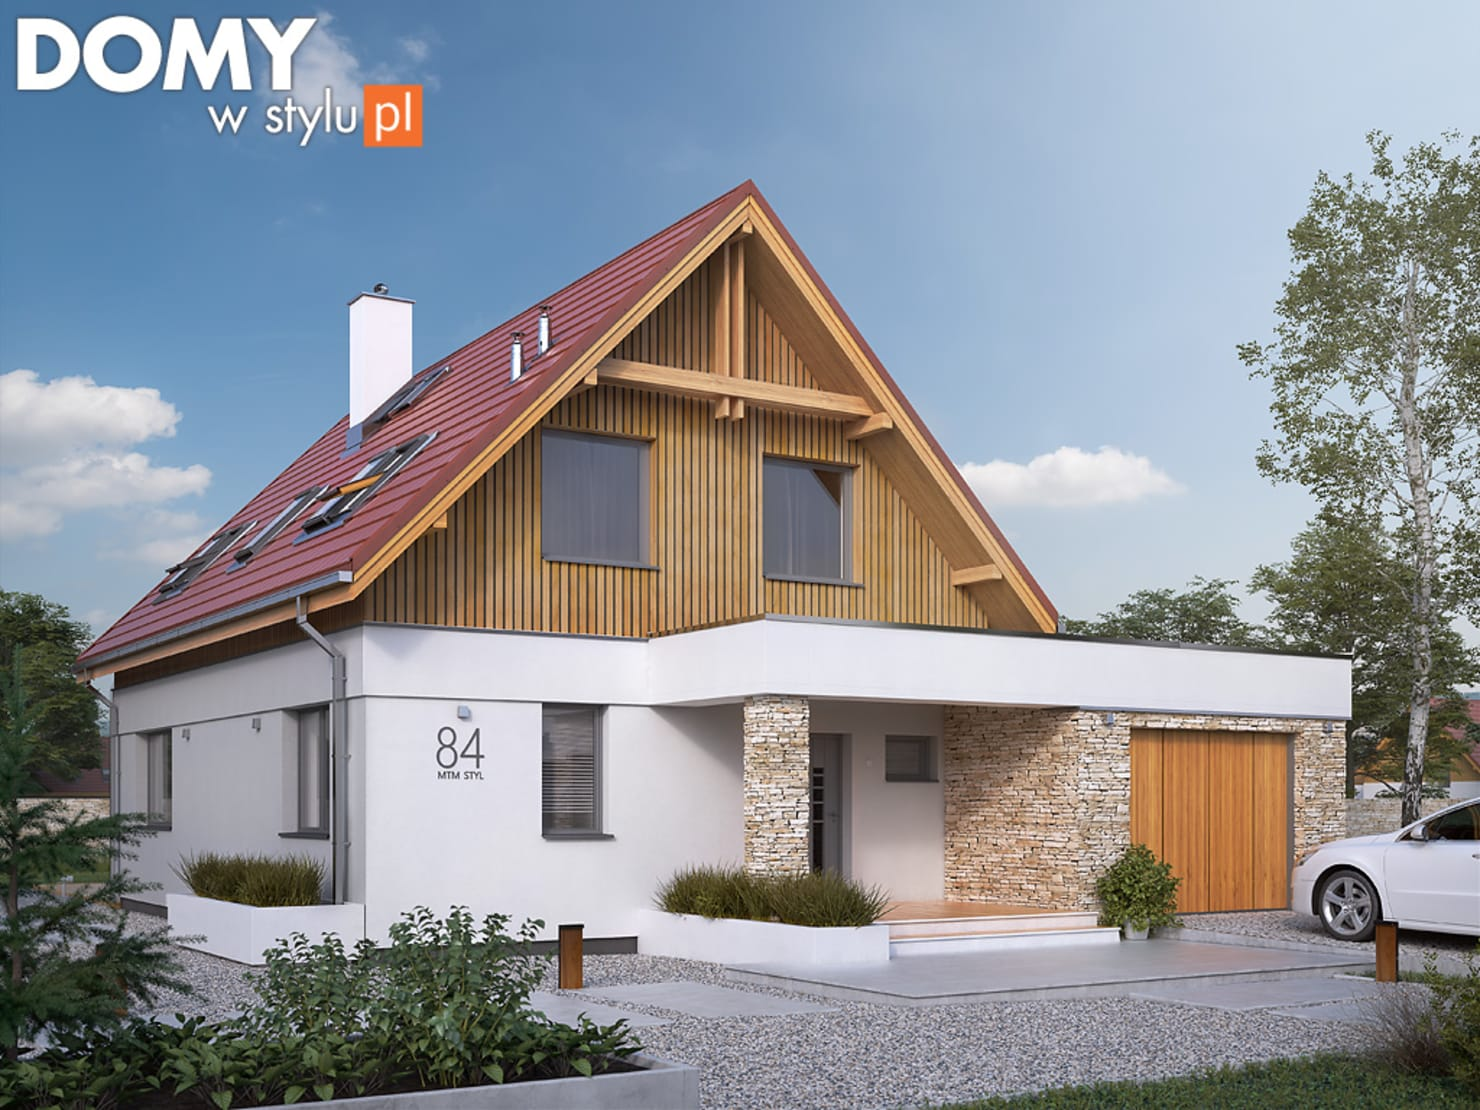 Проект дома за 2,5 млн рублей